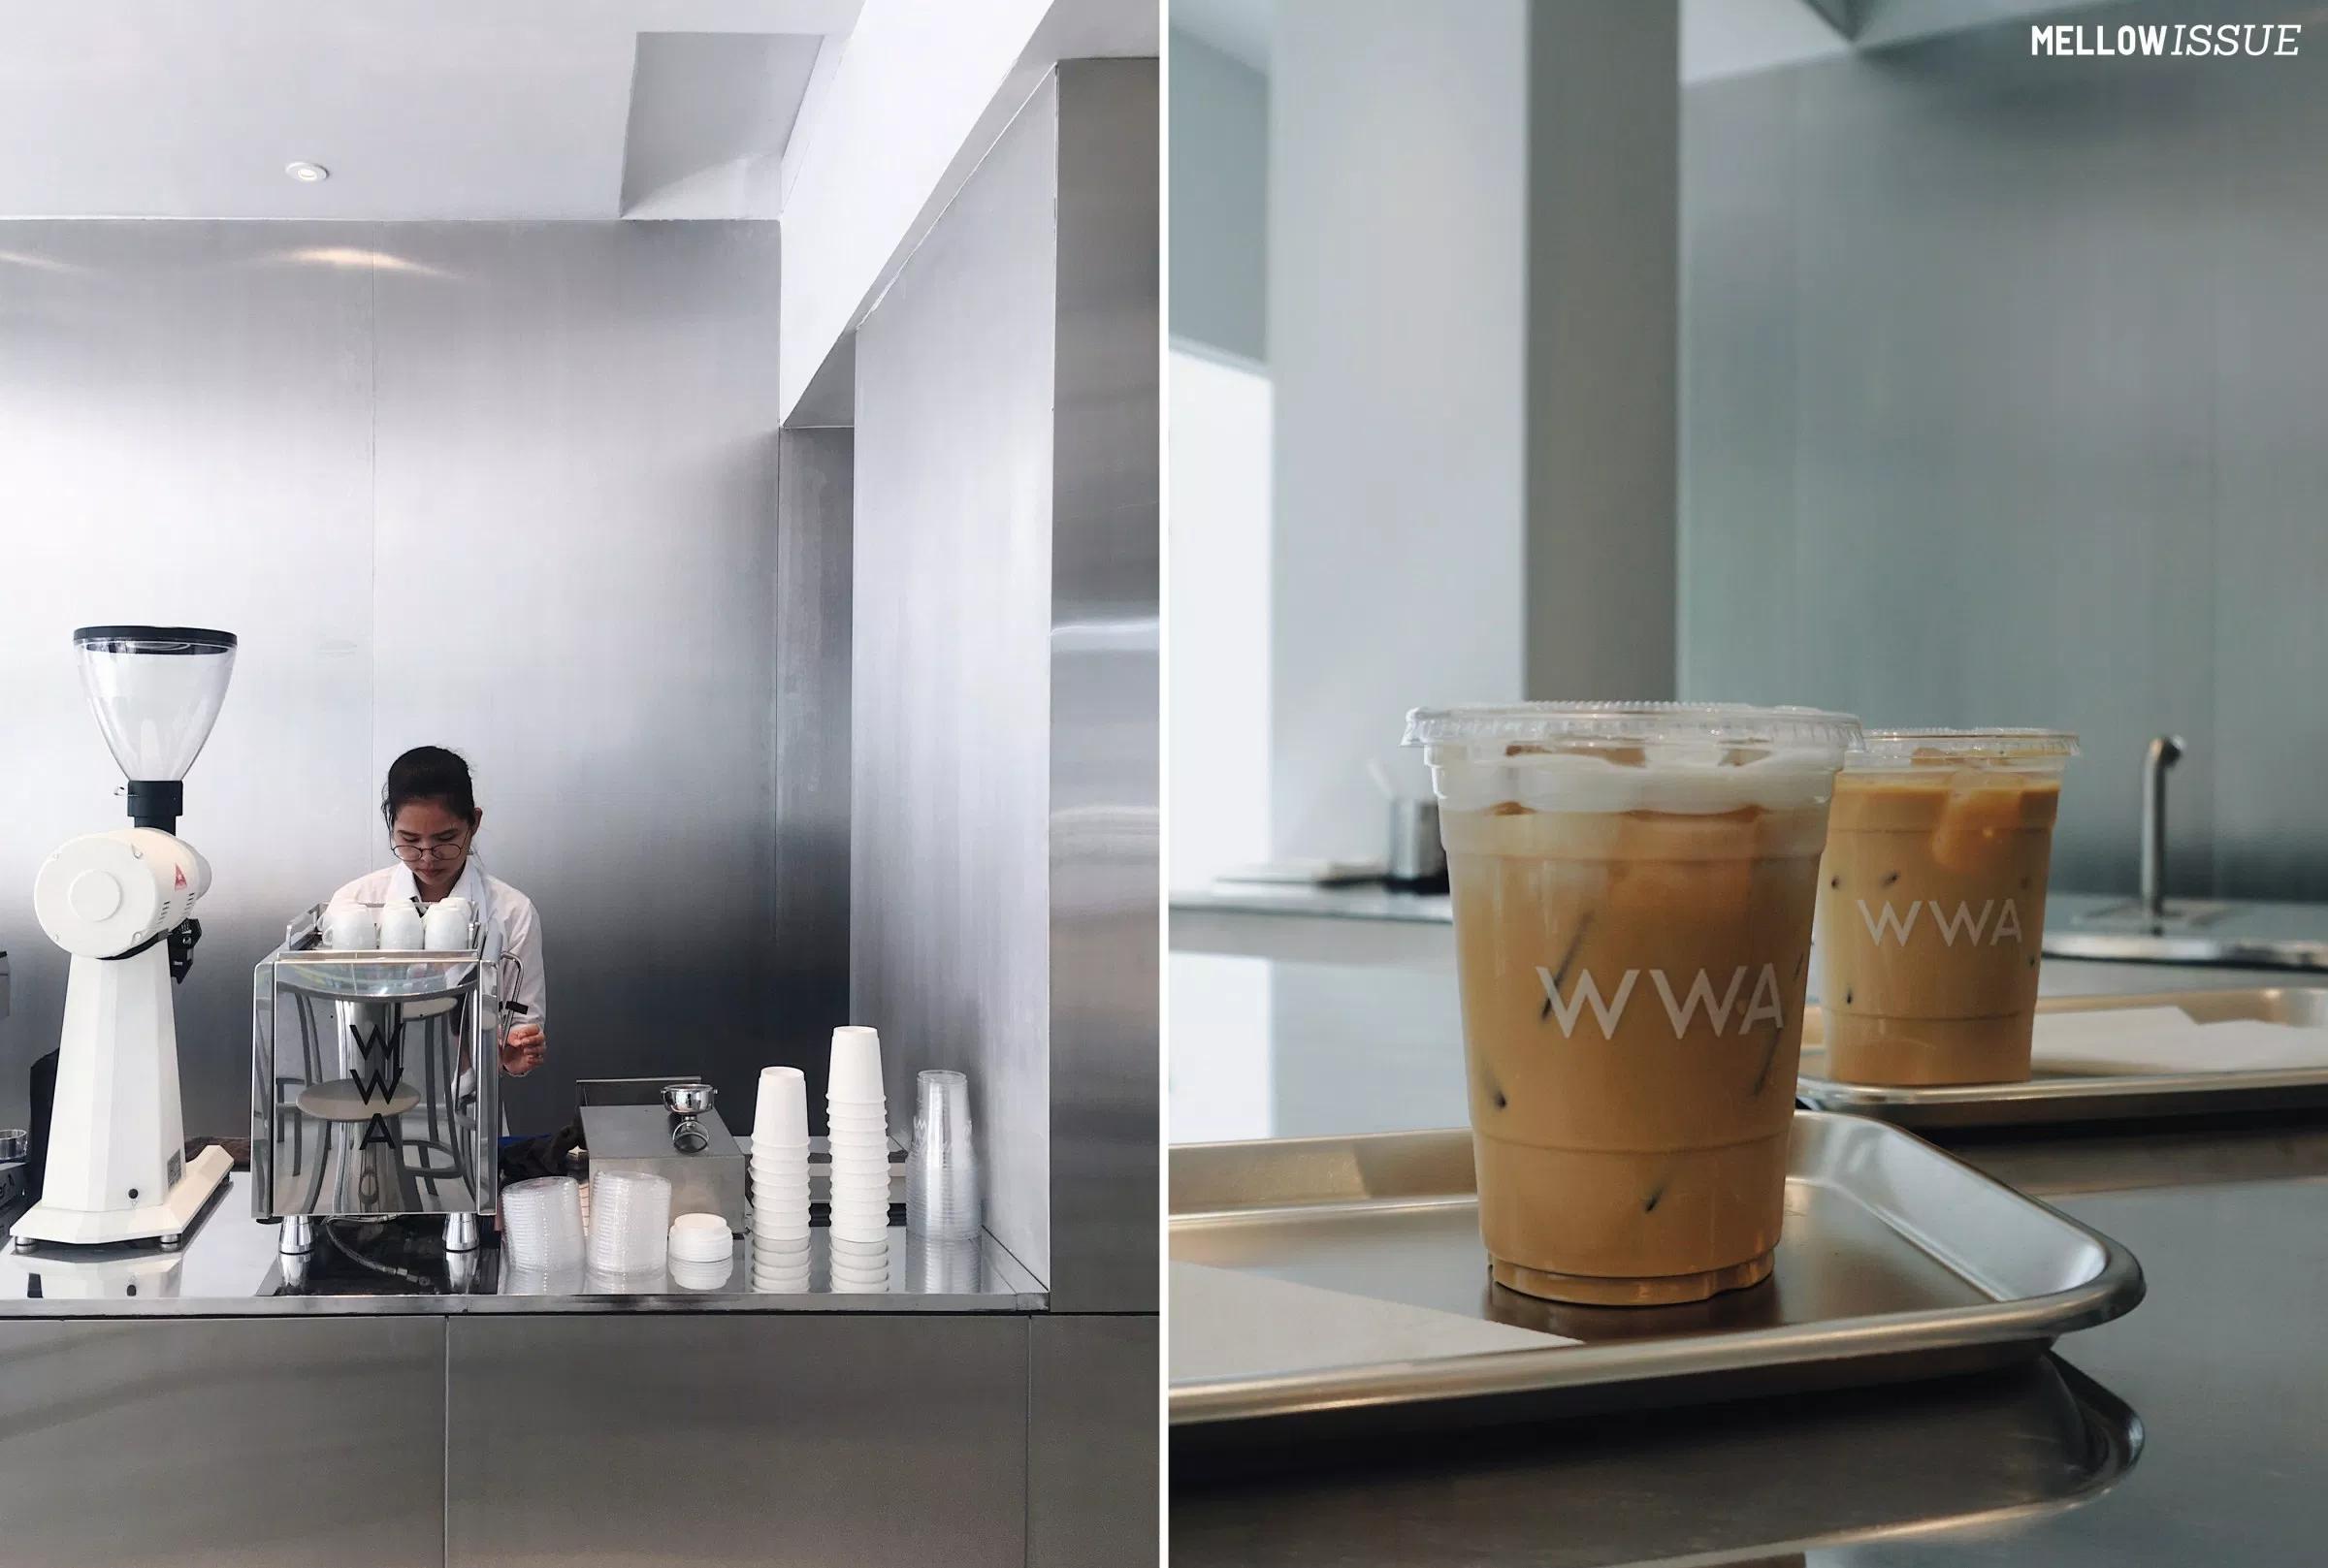 WWA coffee